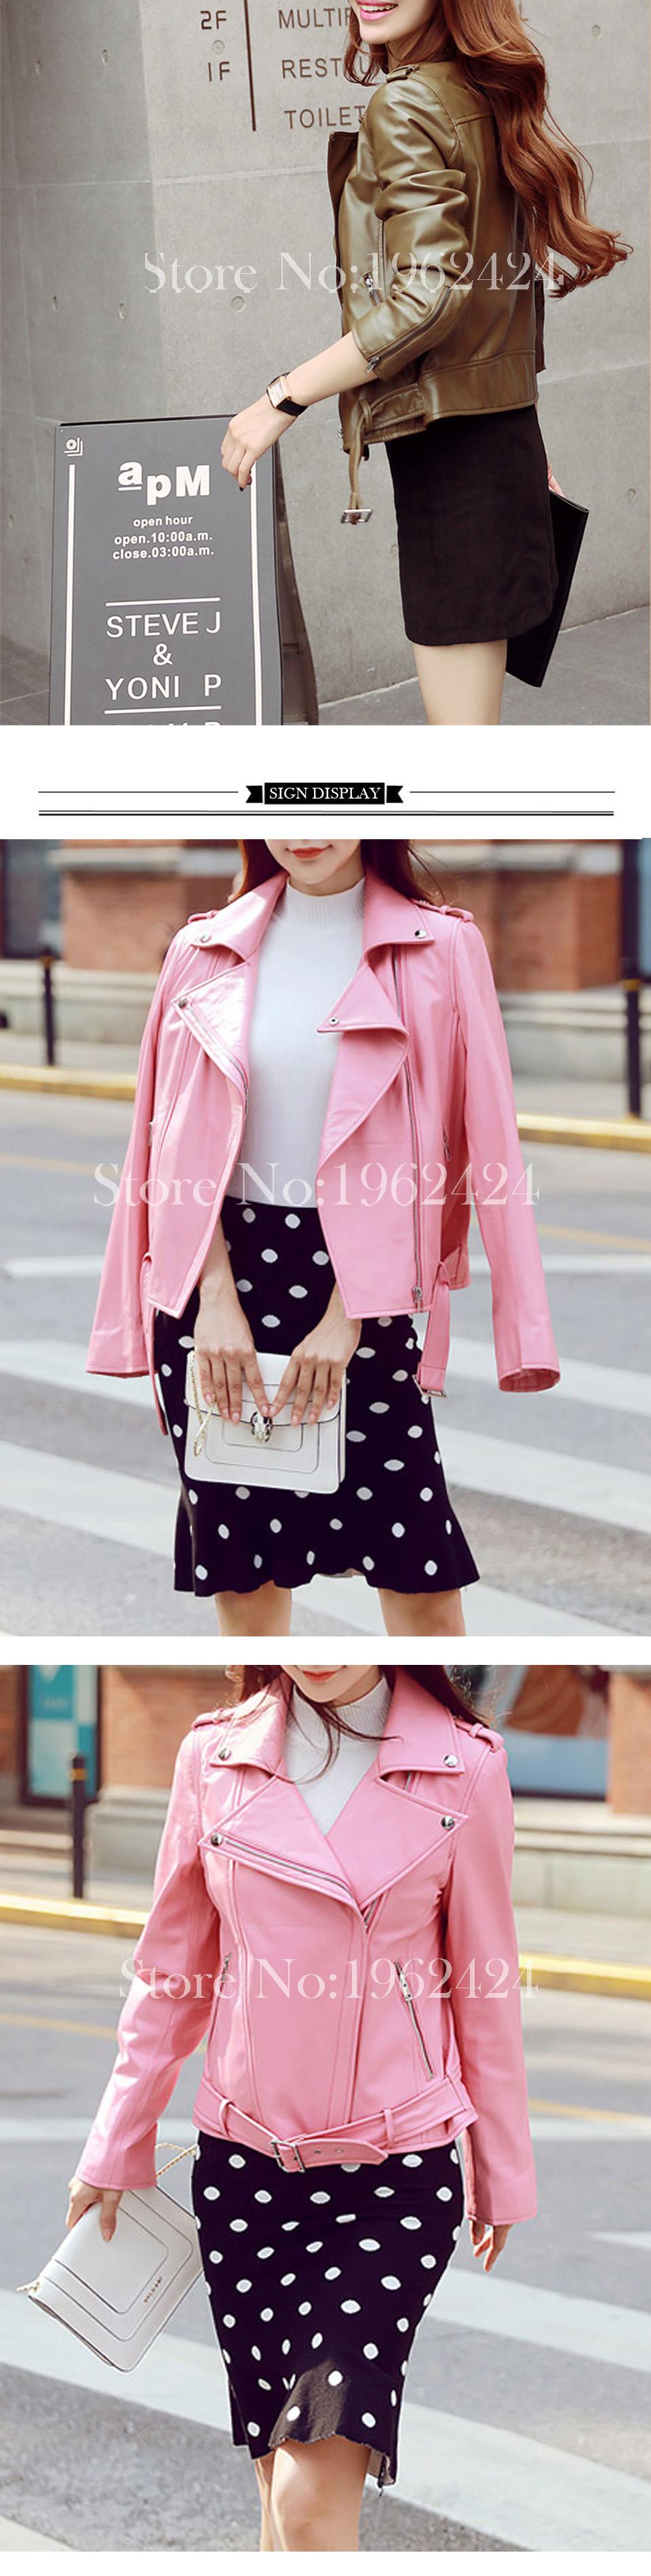 Free shipping 2016 new autumn fashion women high quality sheep skin lapel leather motorcycle jacket short paragraph Slim&XXL